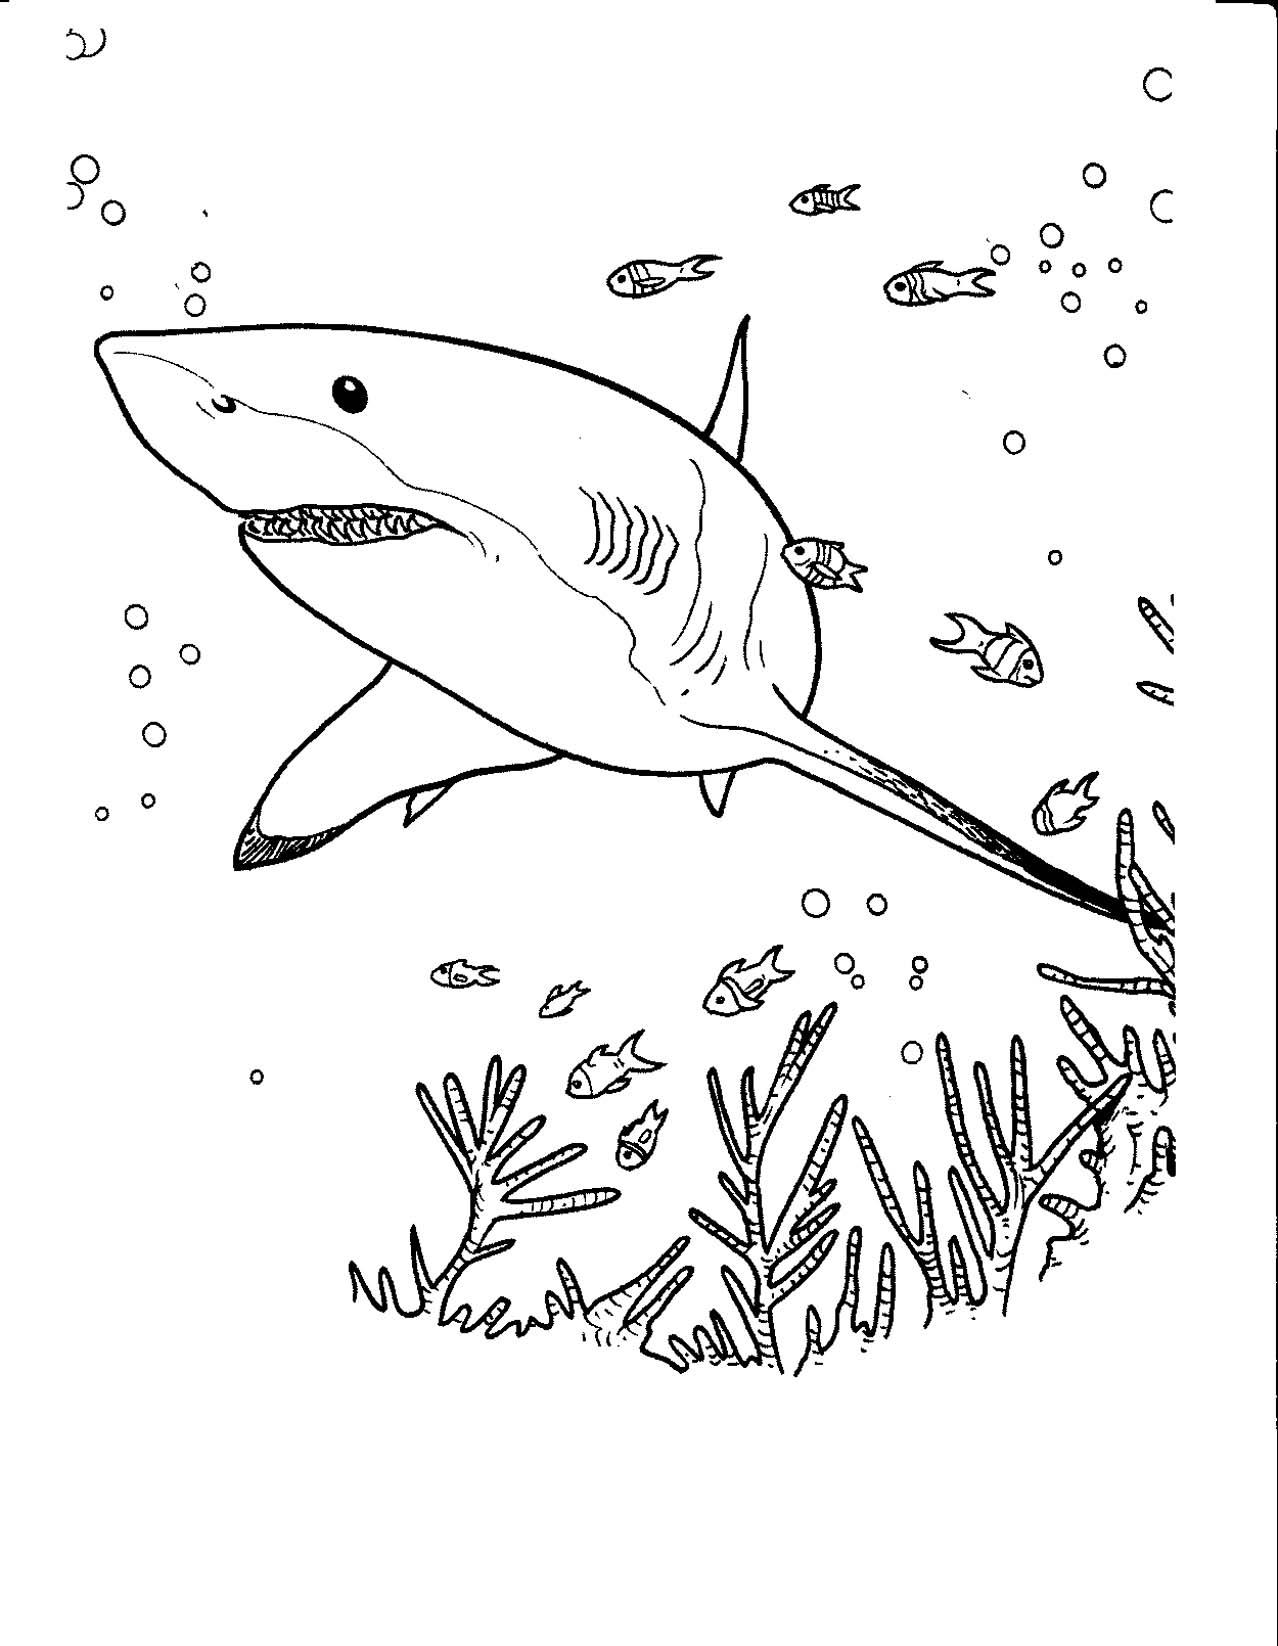 19 Dessins De Coloriage Requin Blanc Imprimer A Imprimer